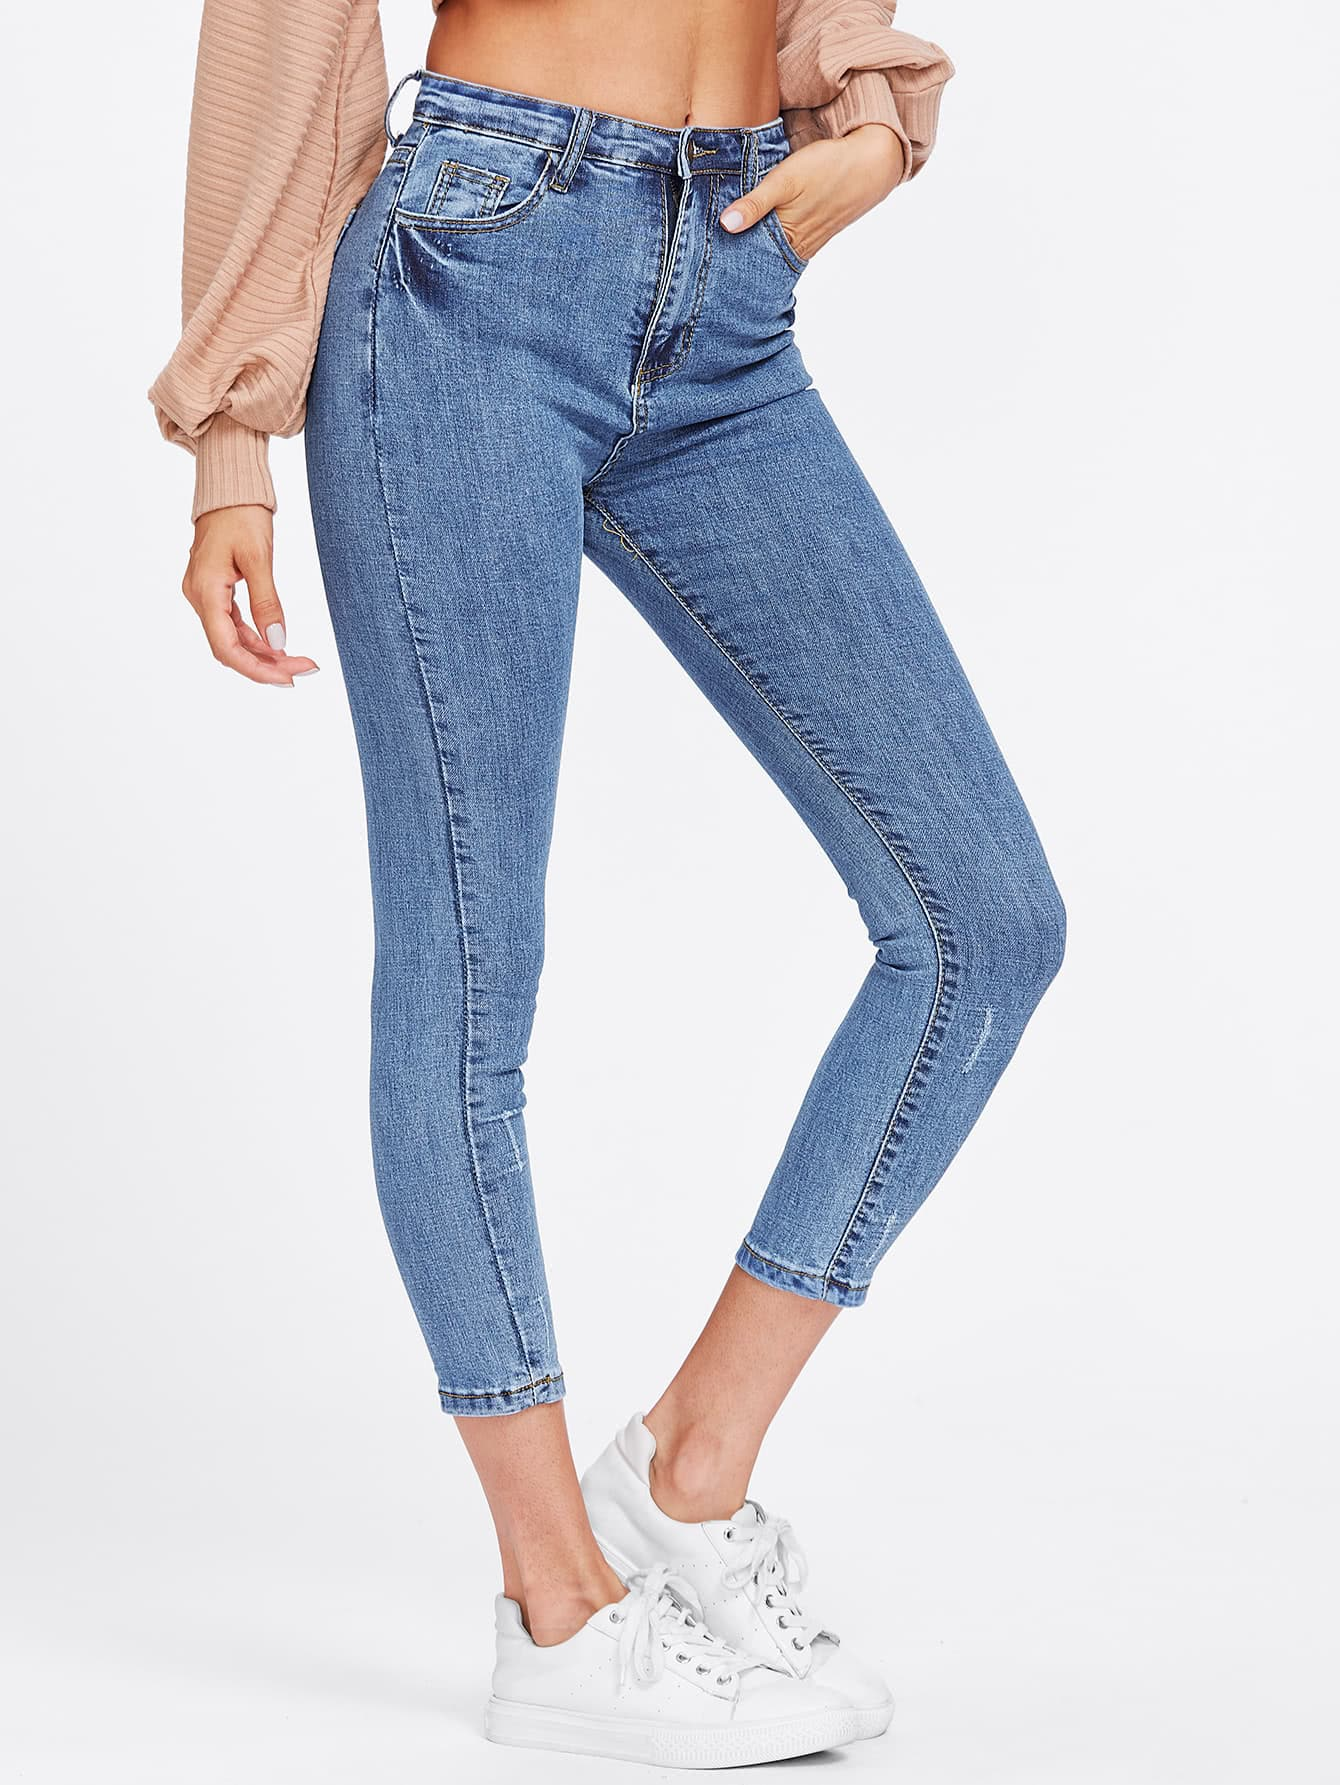 Scratches Crop Skinny Jeans hudson new women s size 28 black luna crop super skinny denim jeans $235 258